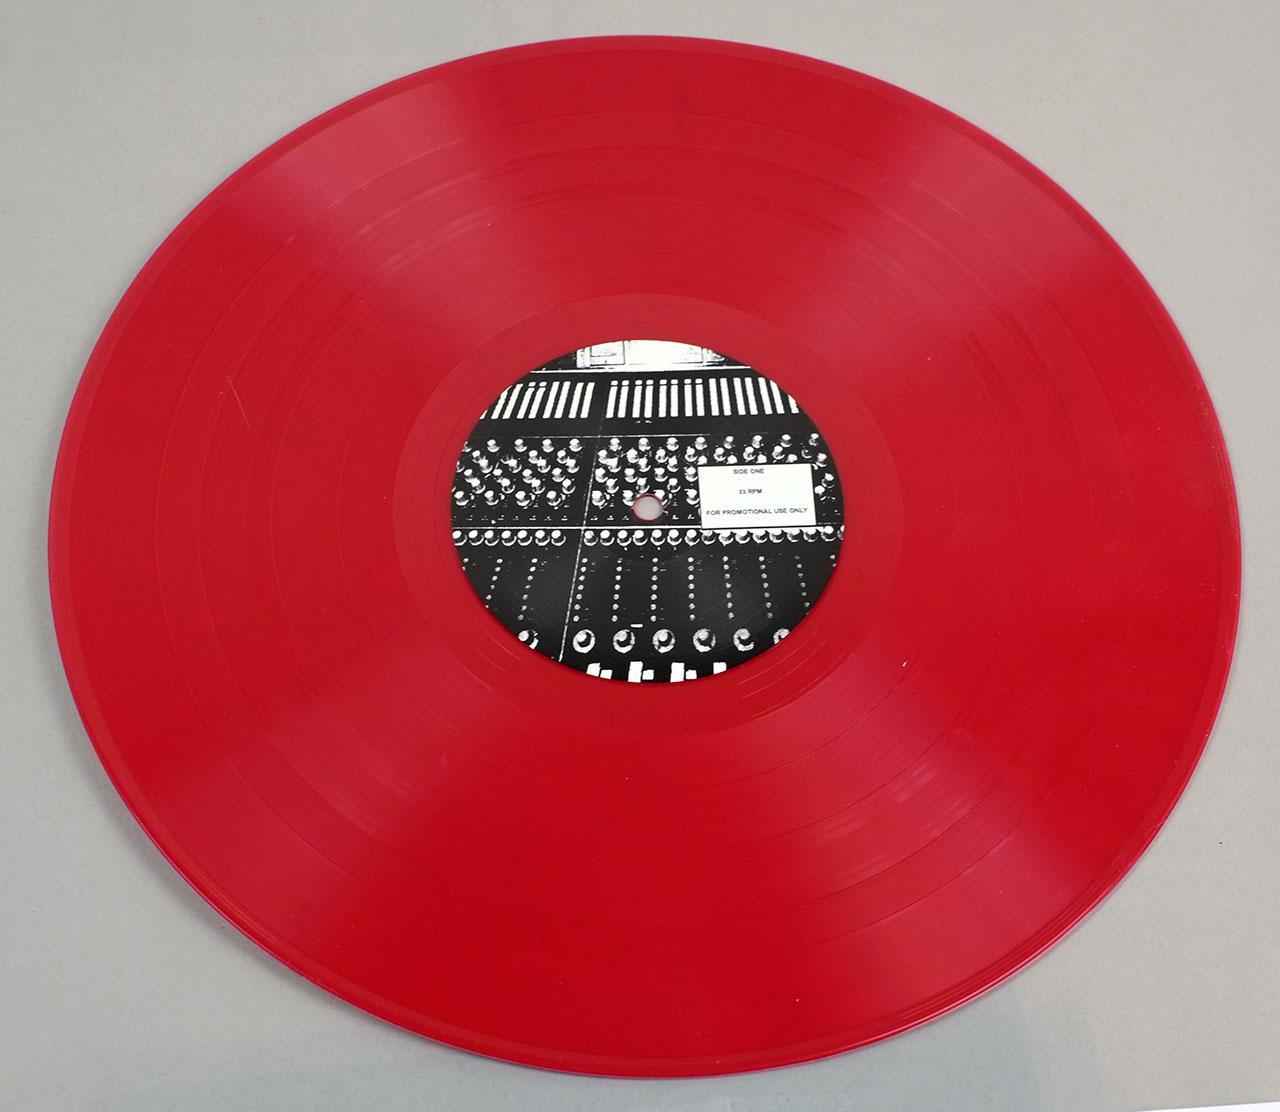 "SLAYER Black Serenade Promo Red Vinyl 12"" Lp Album Vinyl"